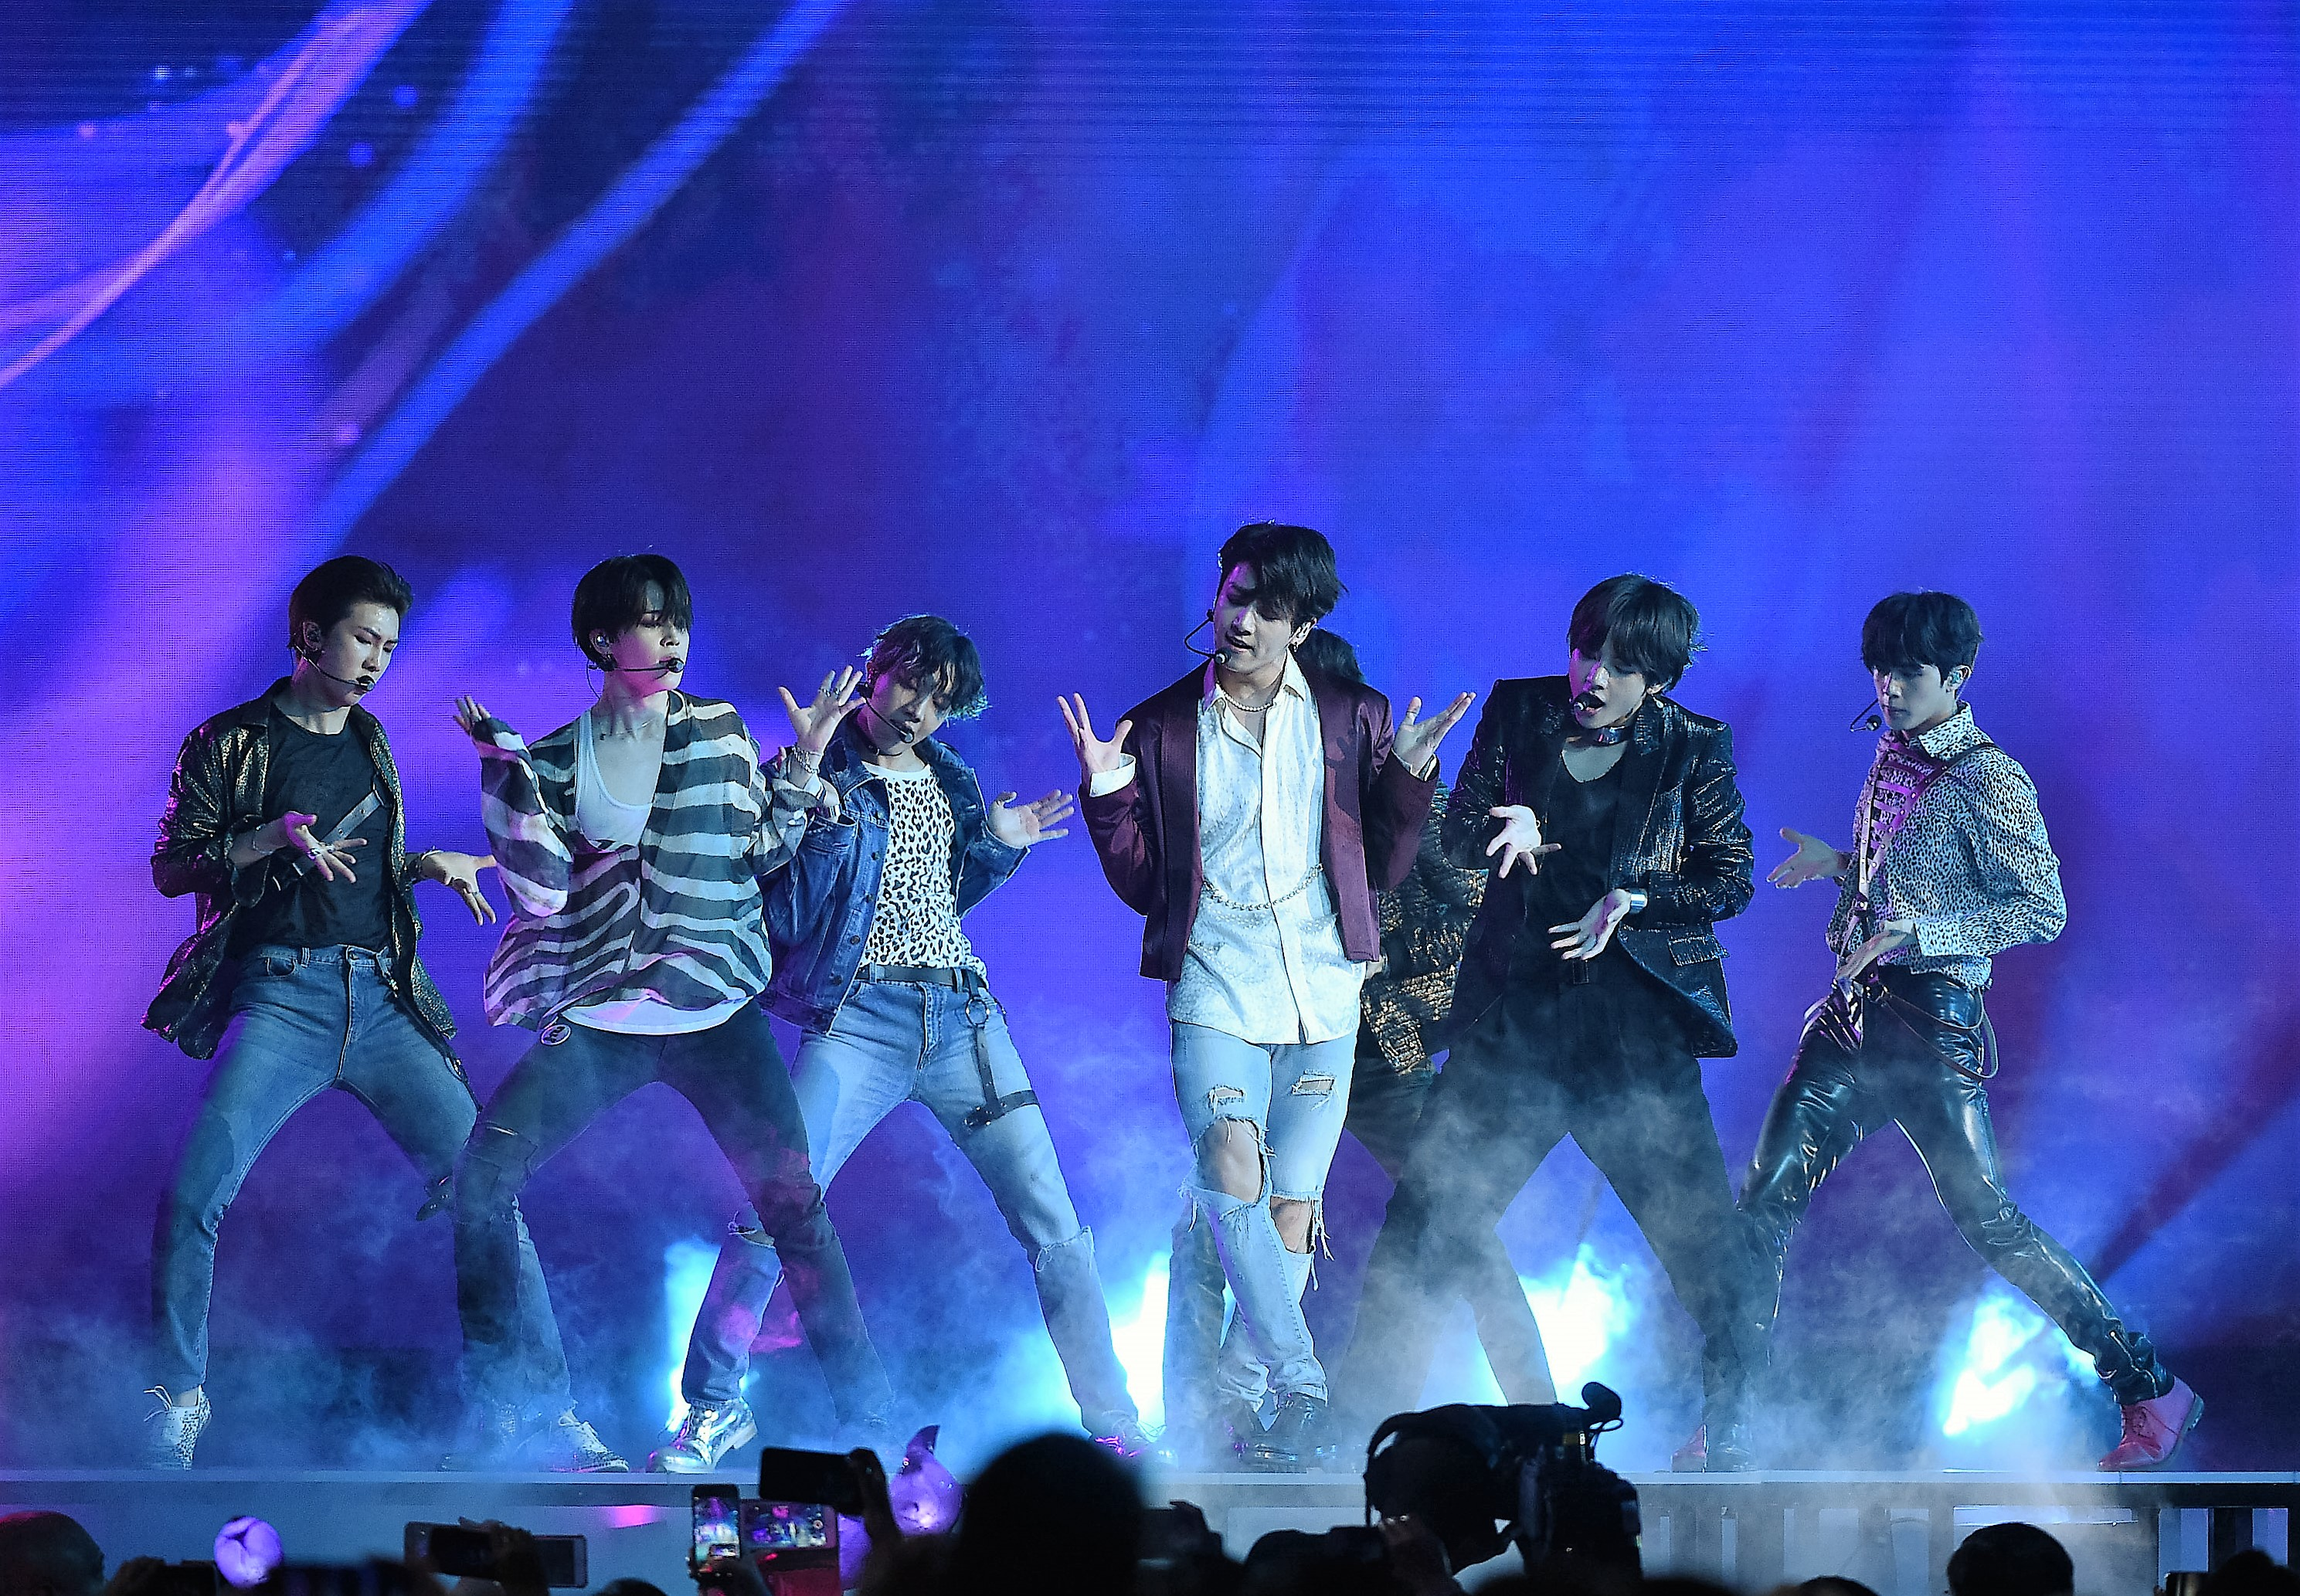 LAS VEGAS, NV - MAY 20:Jungkook, Jimin, V, Suga, Jin, j-hope of BTS perform at the 2018 Billboard Music Awards at MGM Grand Garden Arena on May 20, 2018 in Las Vegas, Nevada. (Photo by Frank Micelotta/PictureGroup/Sipa USA)